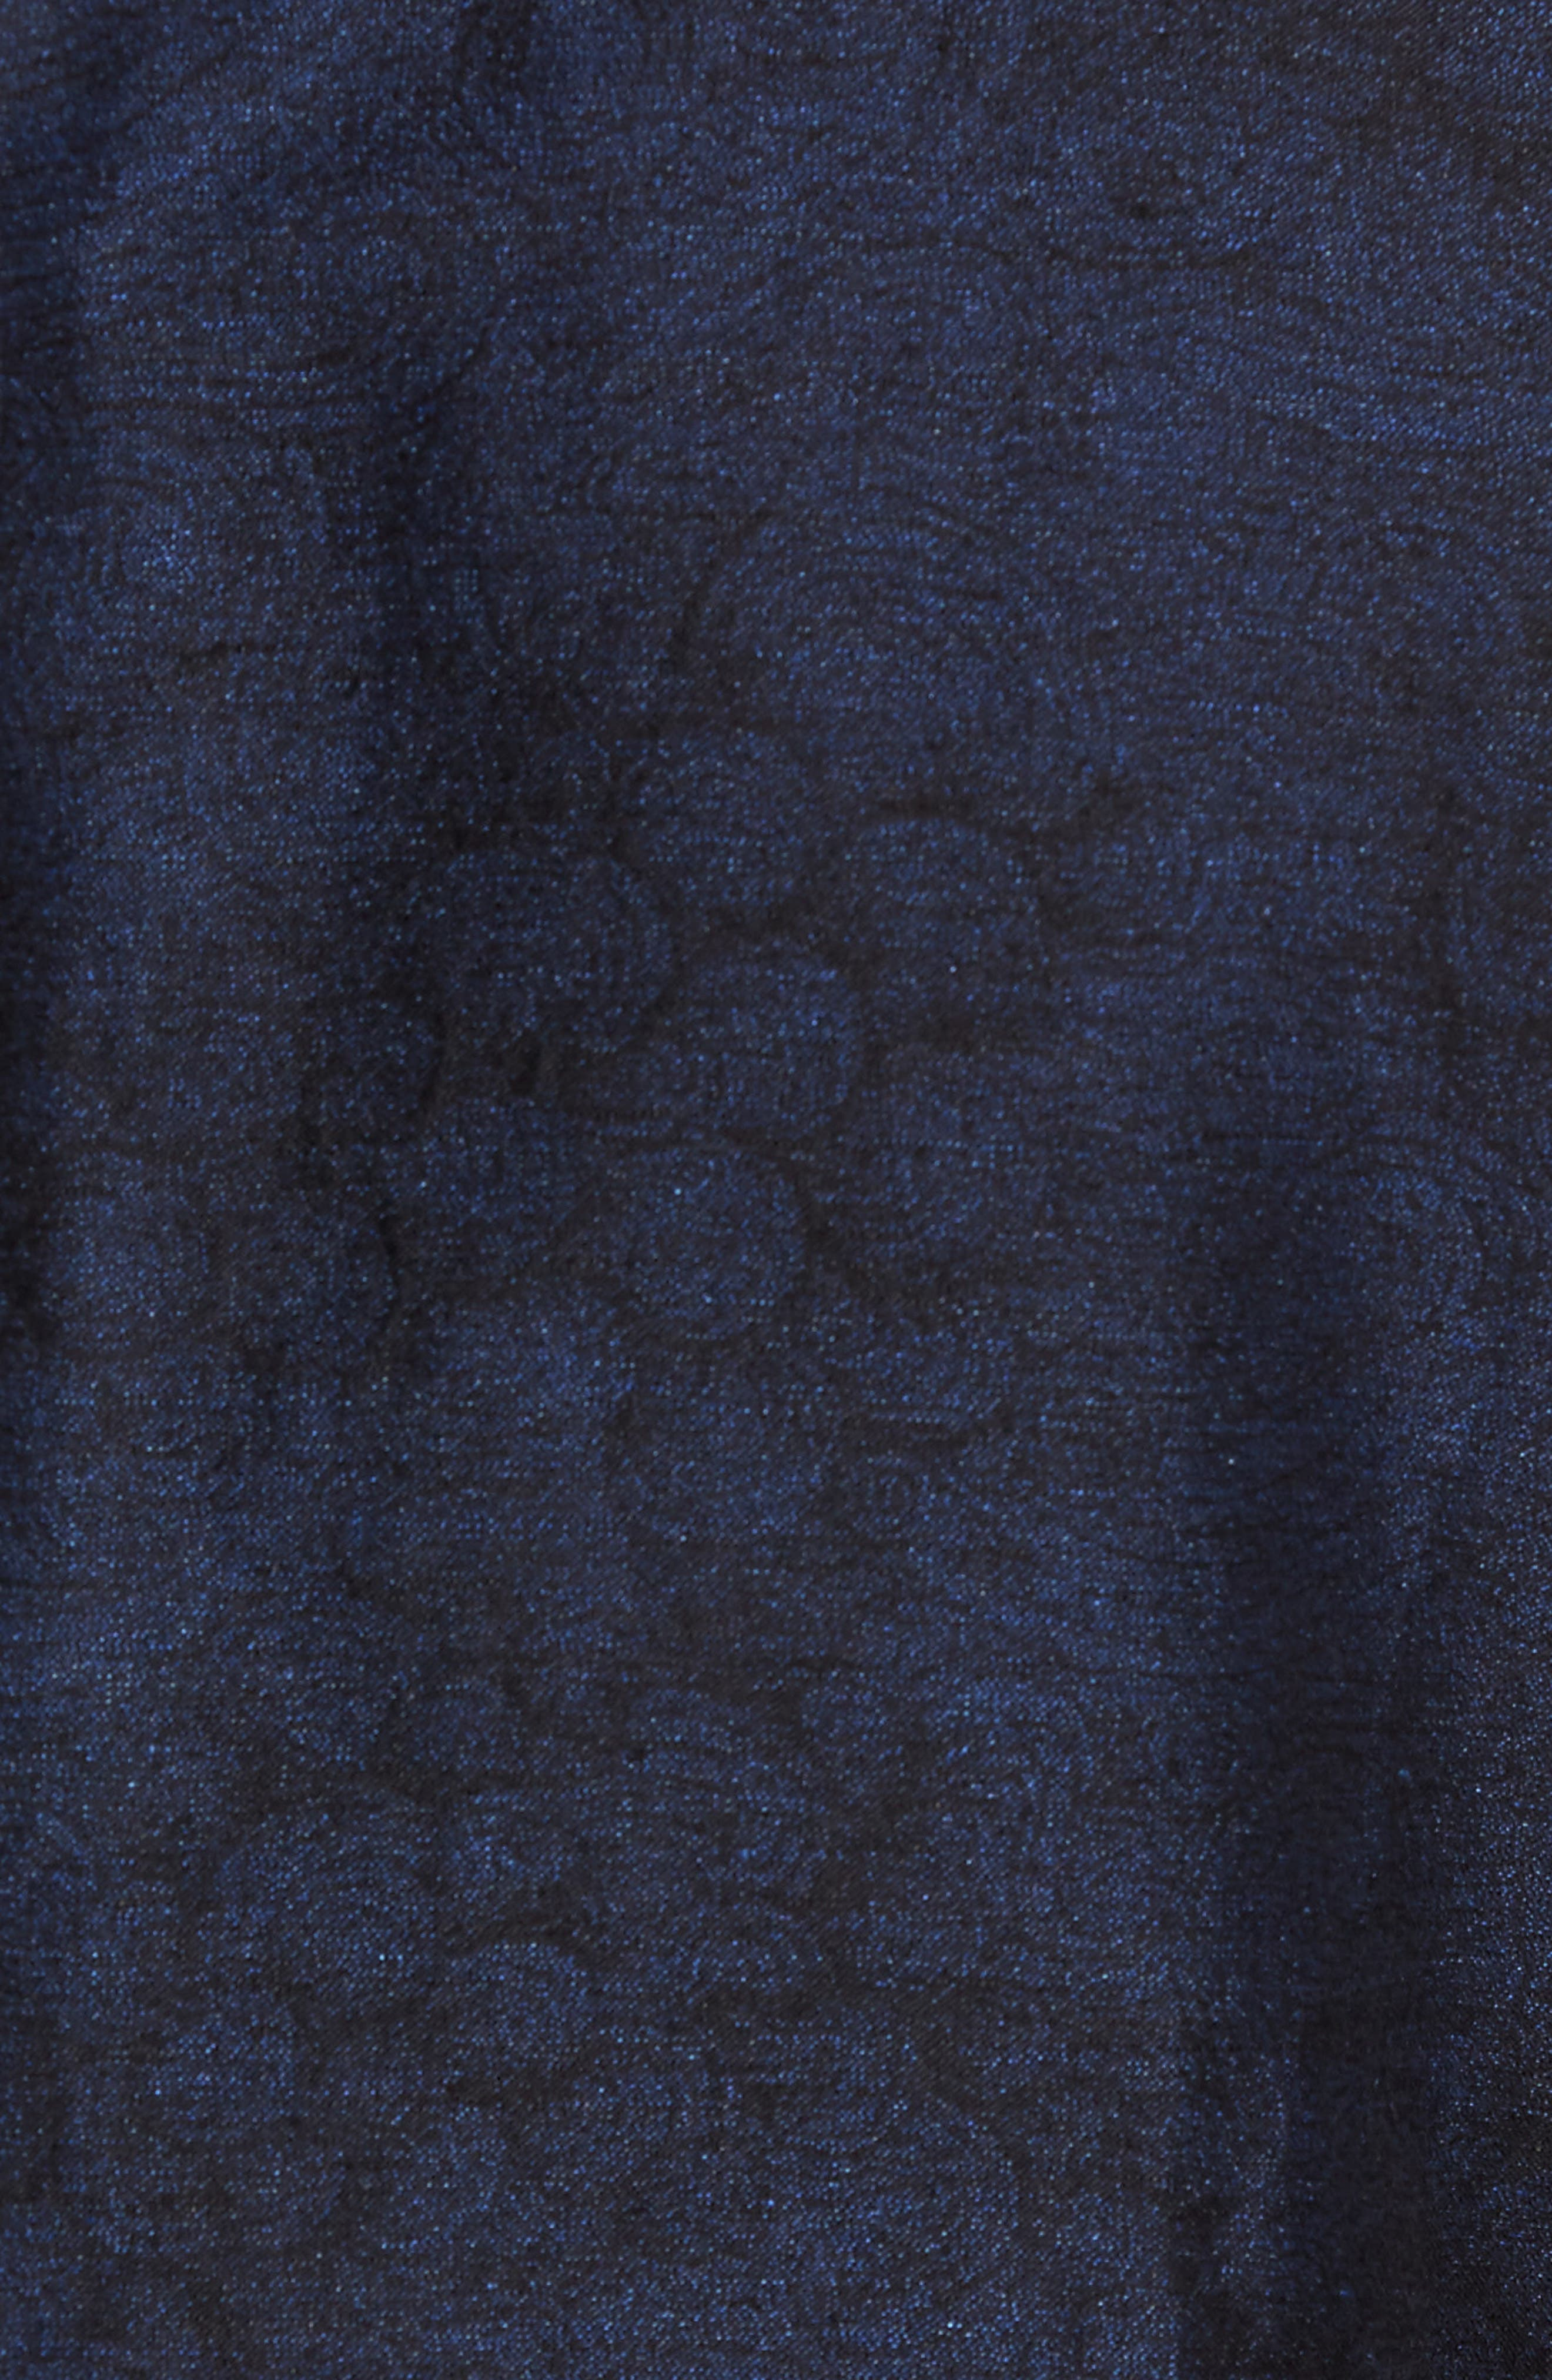 Slim Fit Patterned Linen Blend Sport Coat,                             Alternate thumbnail 5, color,                             Indigo Blue